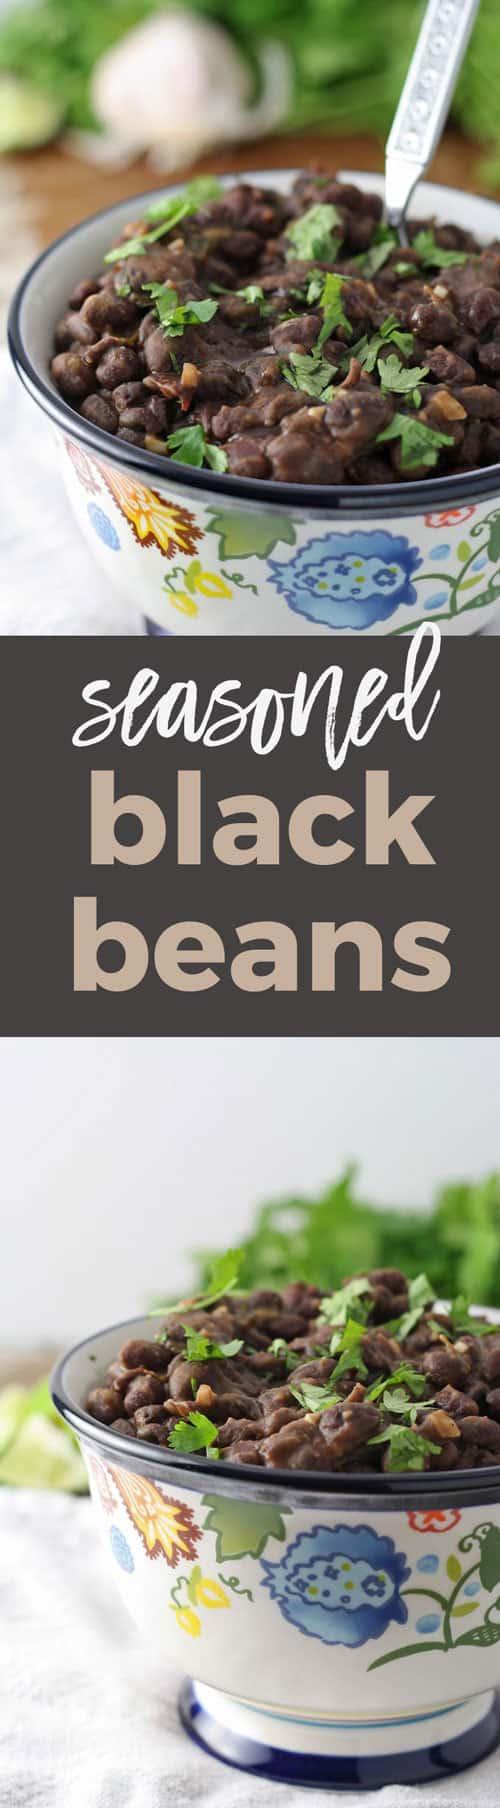 seasoned black beans side dish pin